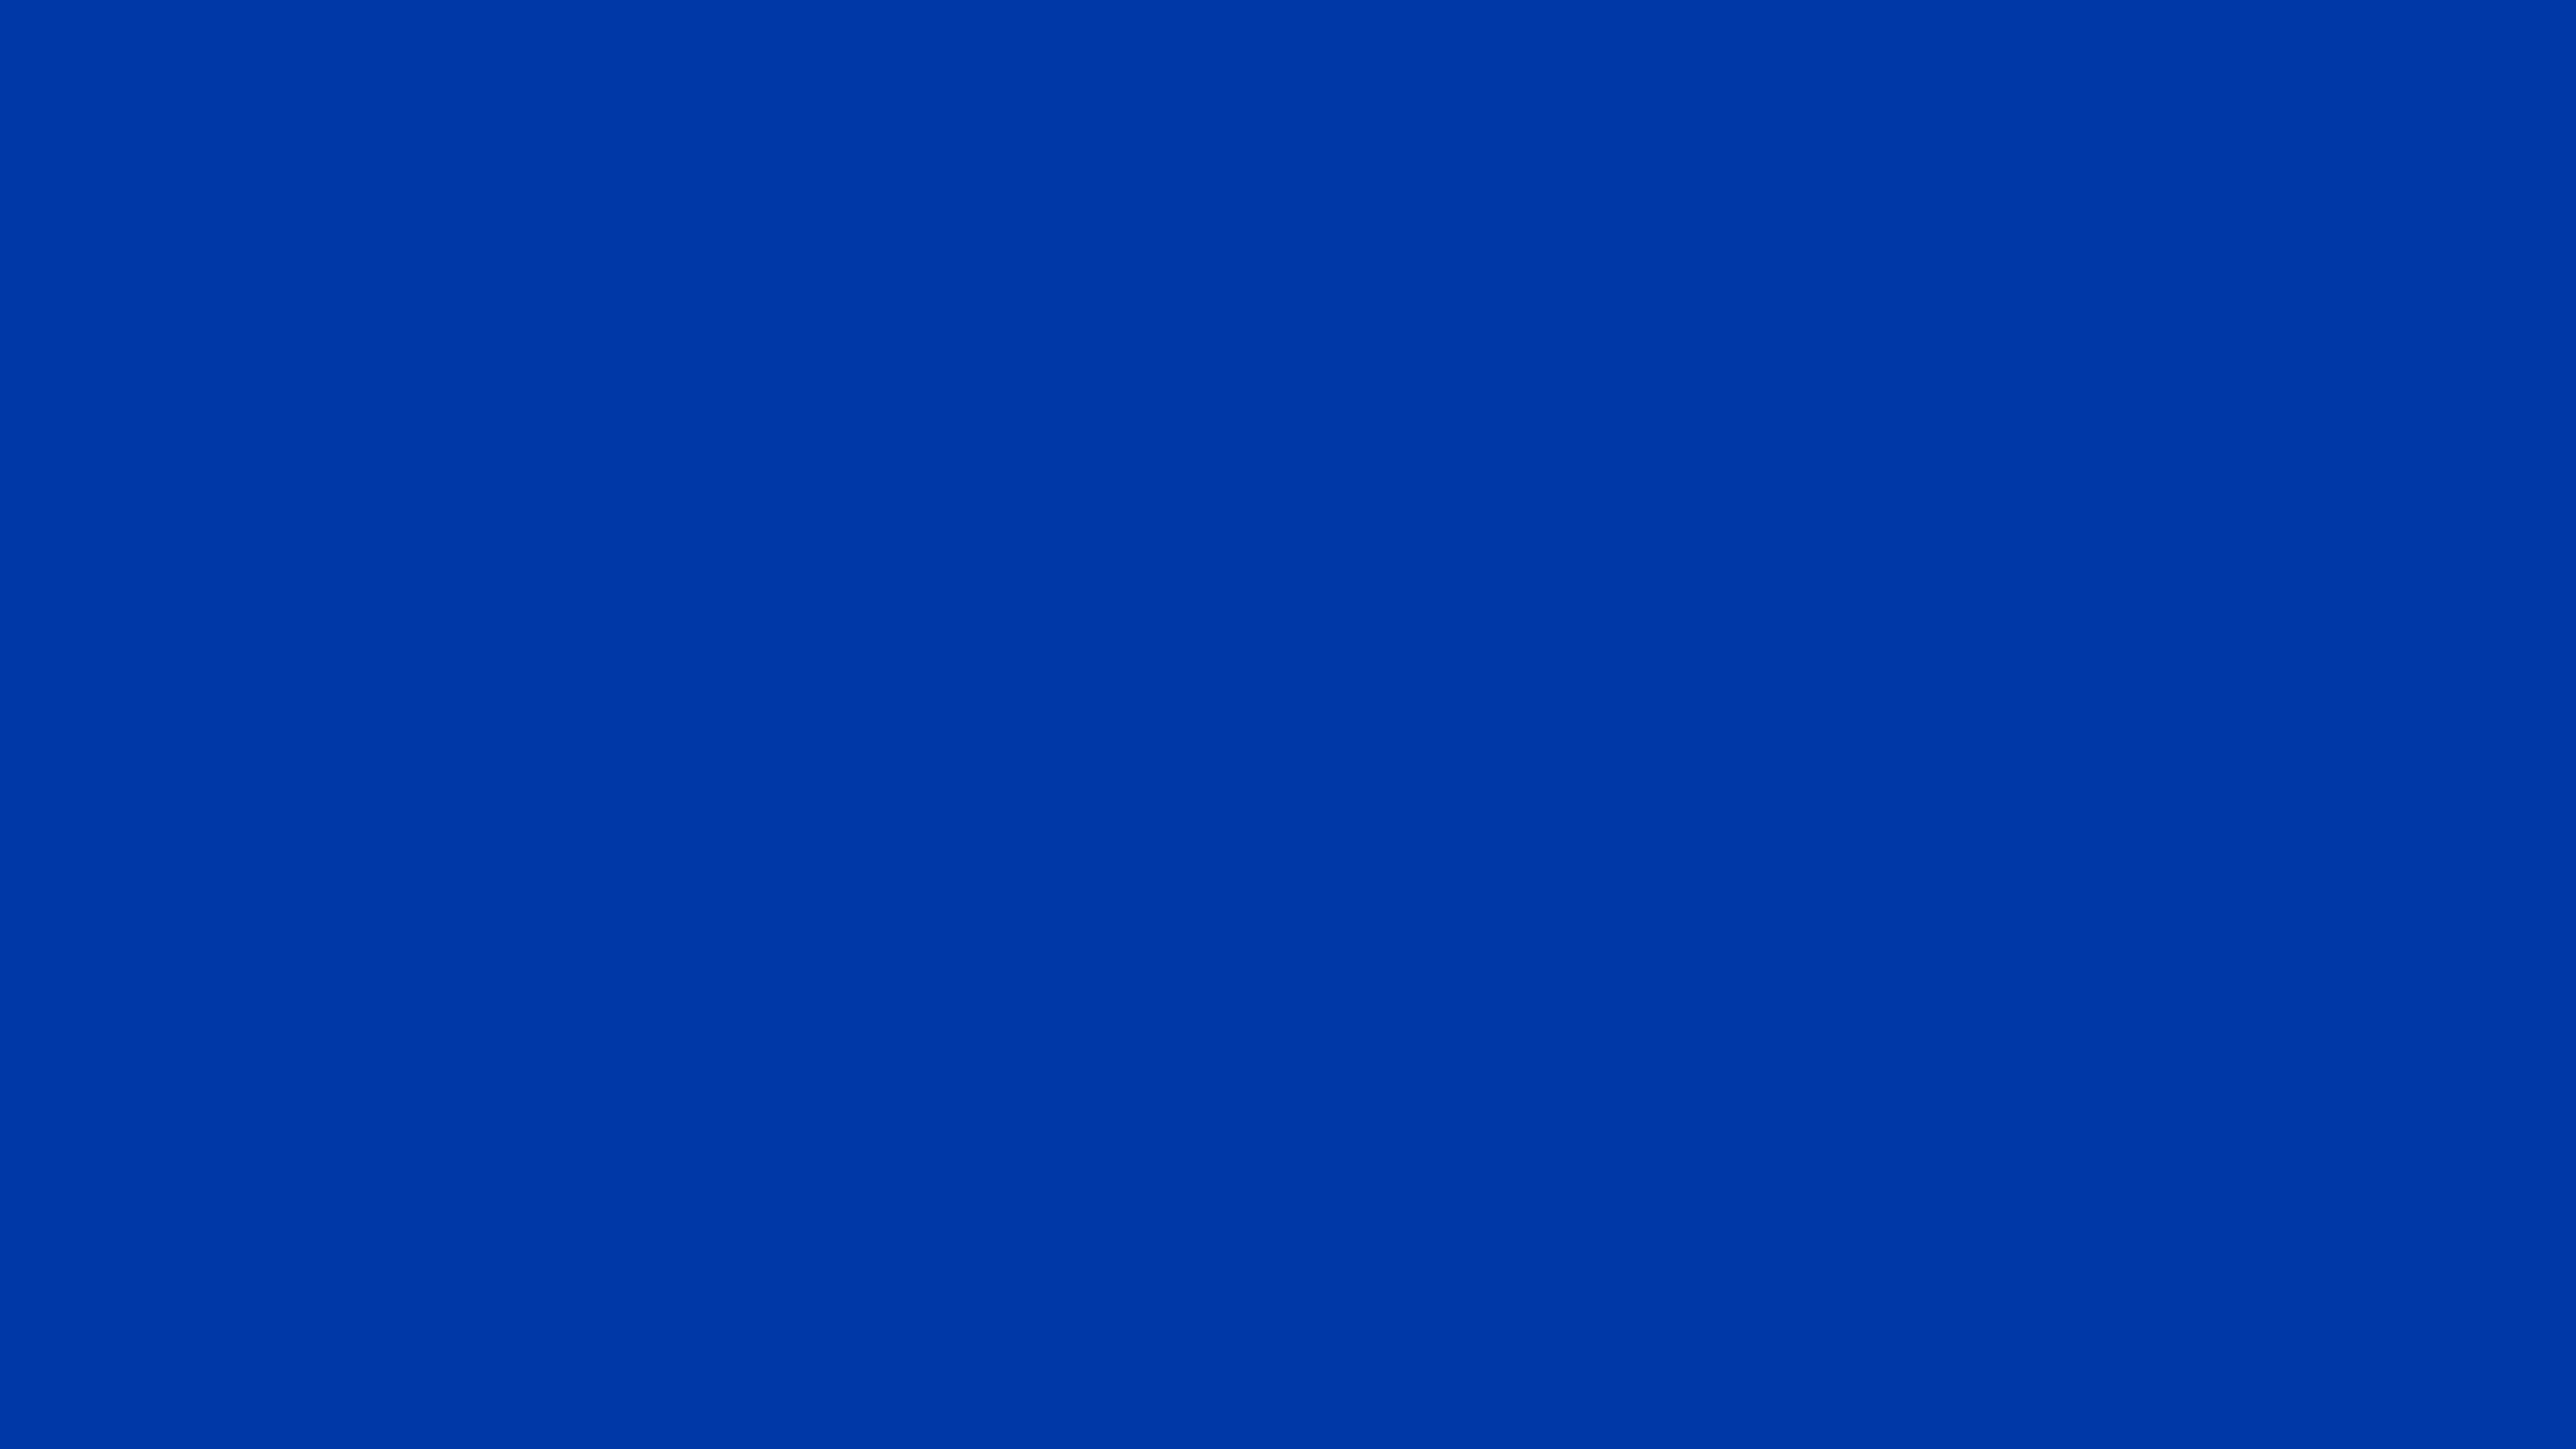 7680x4320 Royal Azure Solid Color Background